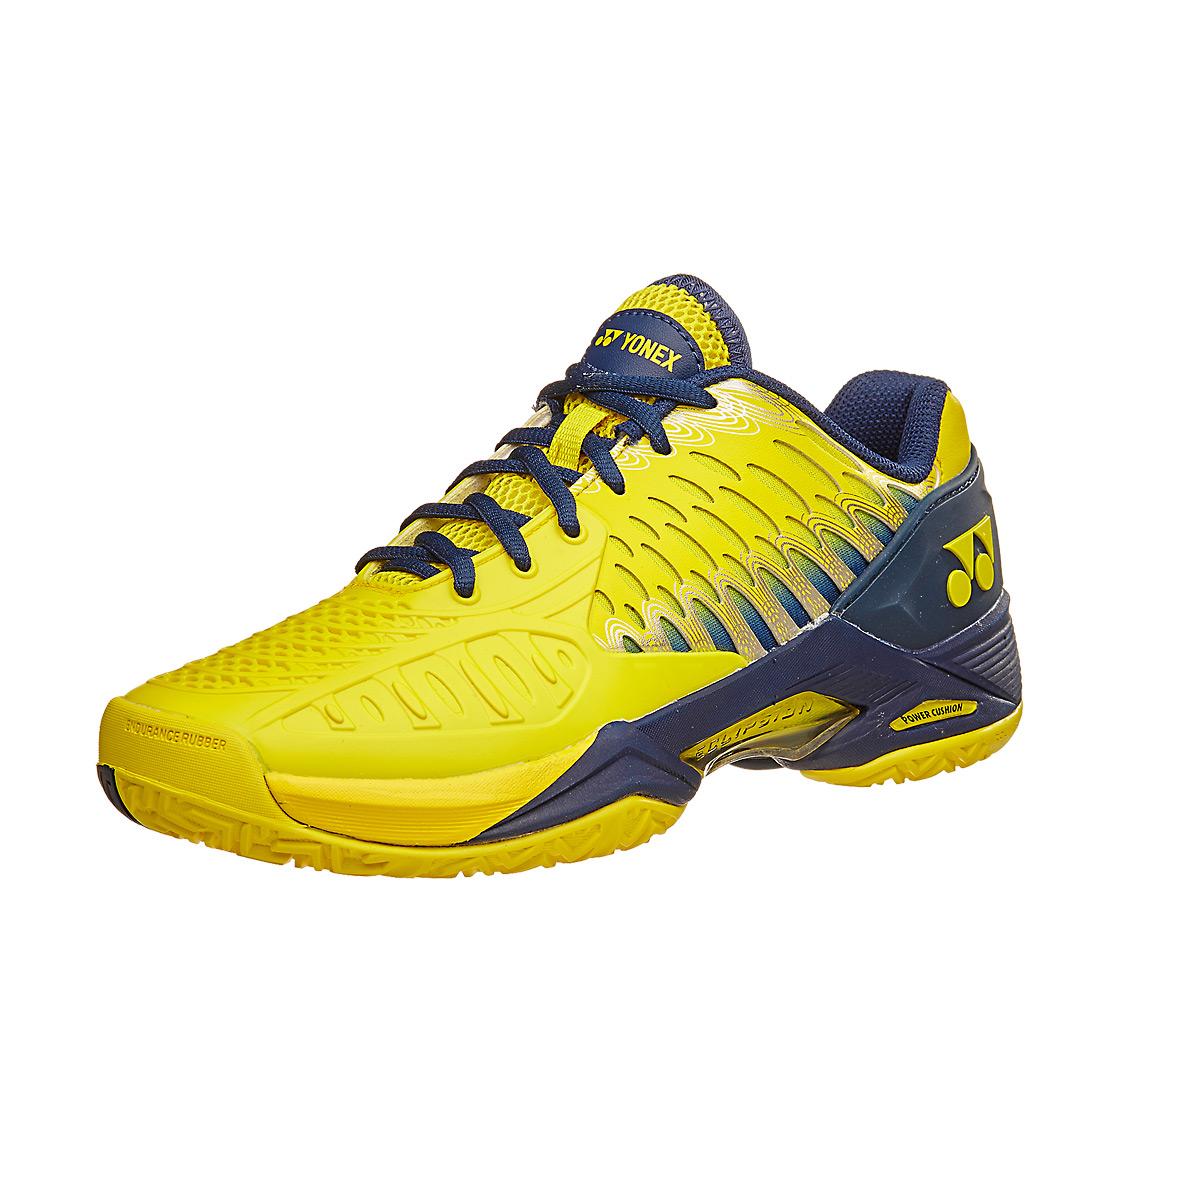 Tenisová obuv YONEX SHT ECLIPSION 2 Clay vel. 43